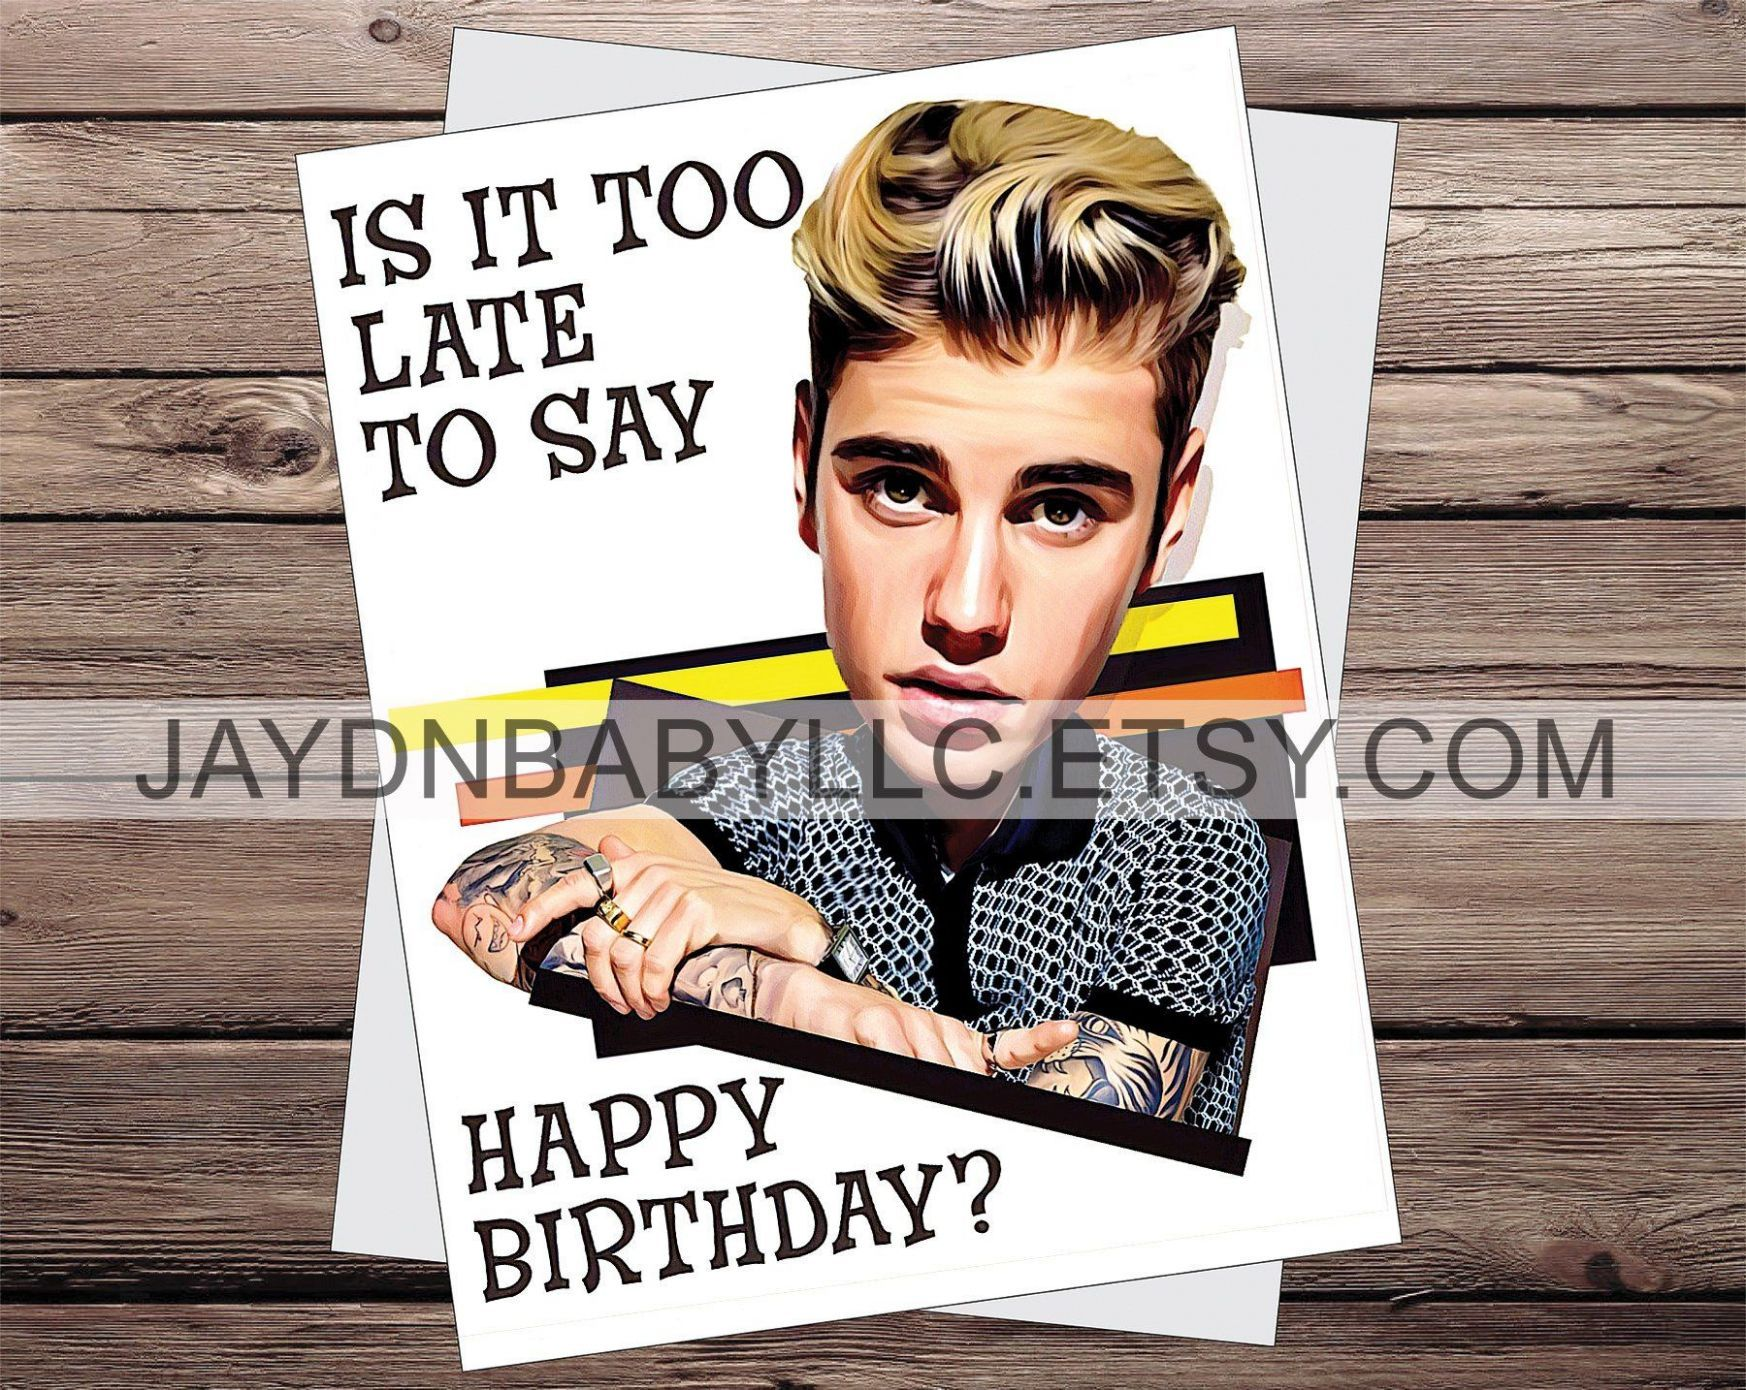 5 Justin Bieber Happy Birthday Card di 5